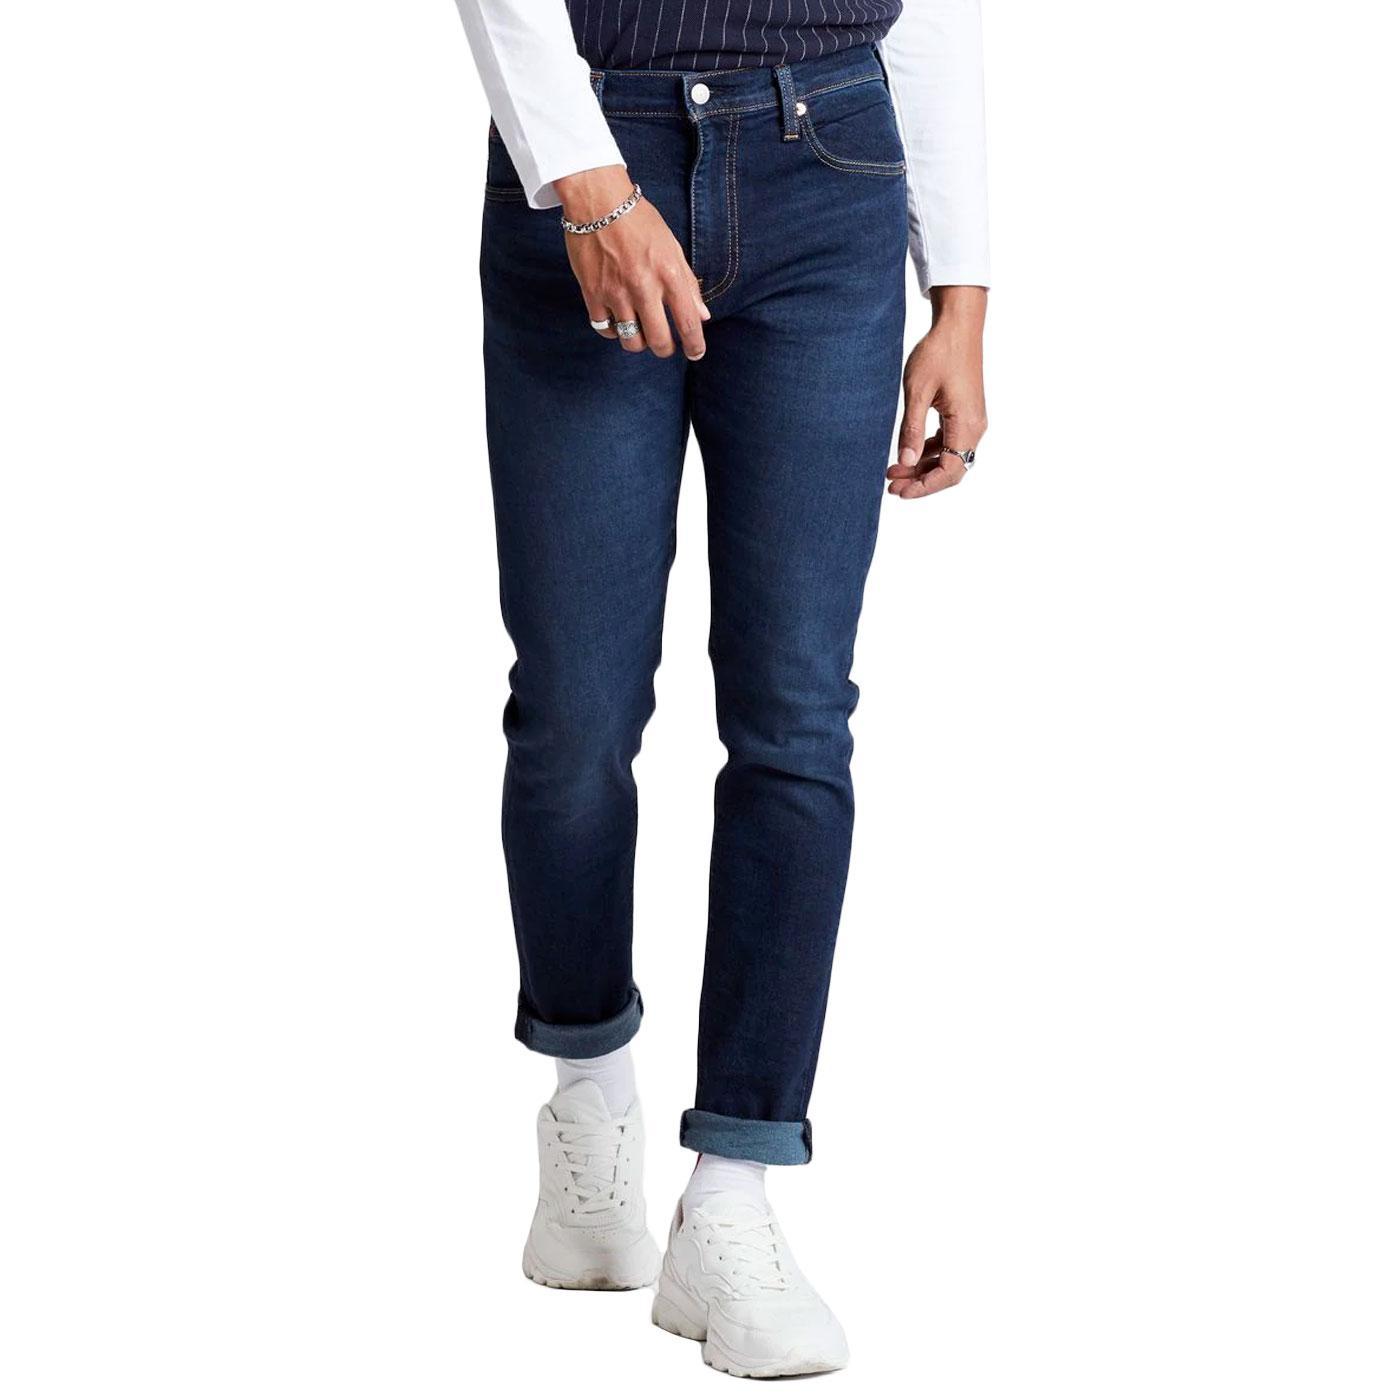 LEVI'S 512 Slim Taper Denim Jeans SAGE DARK BLUE